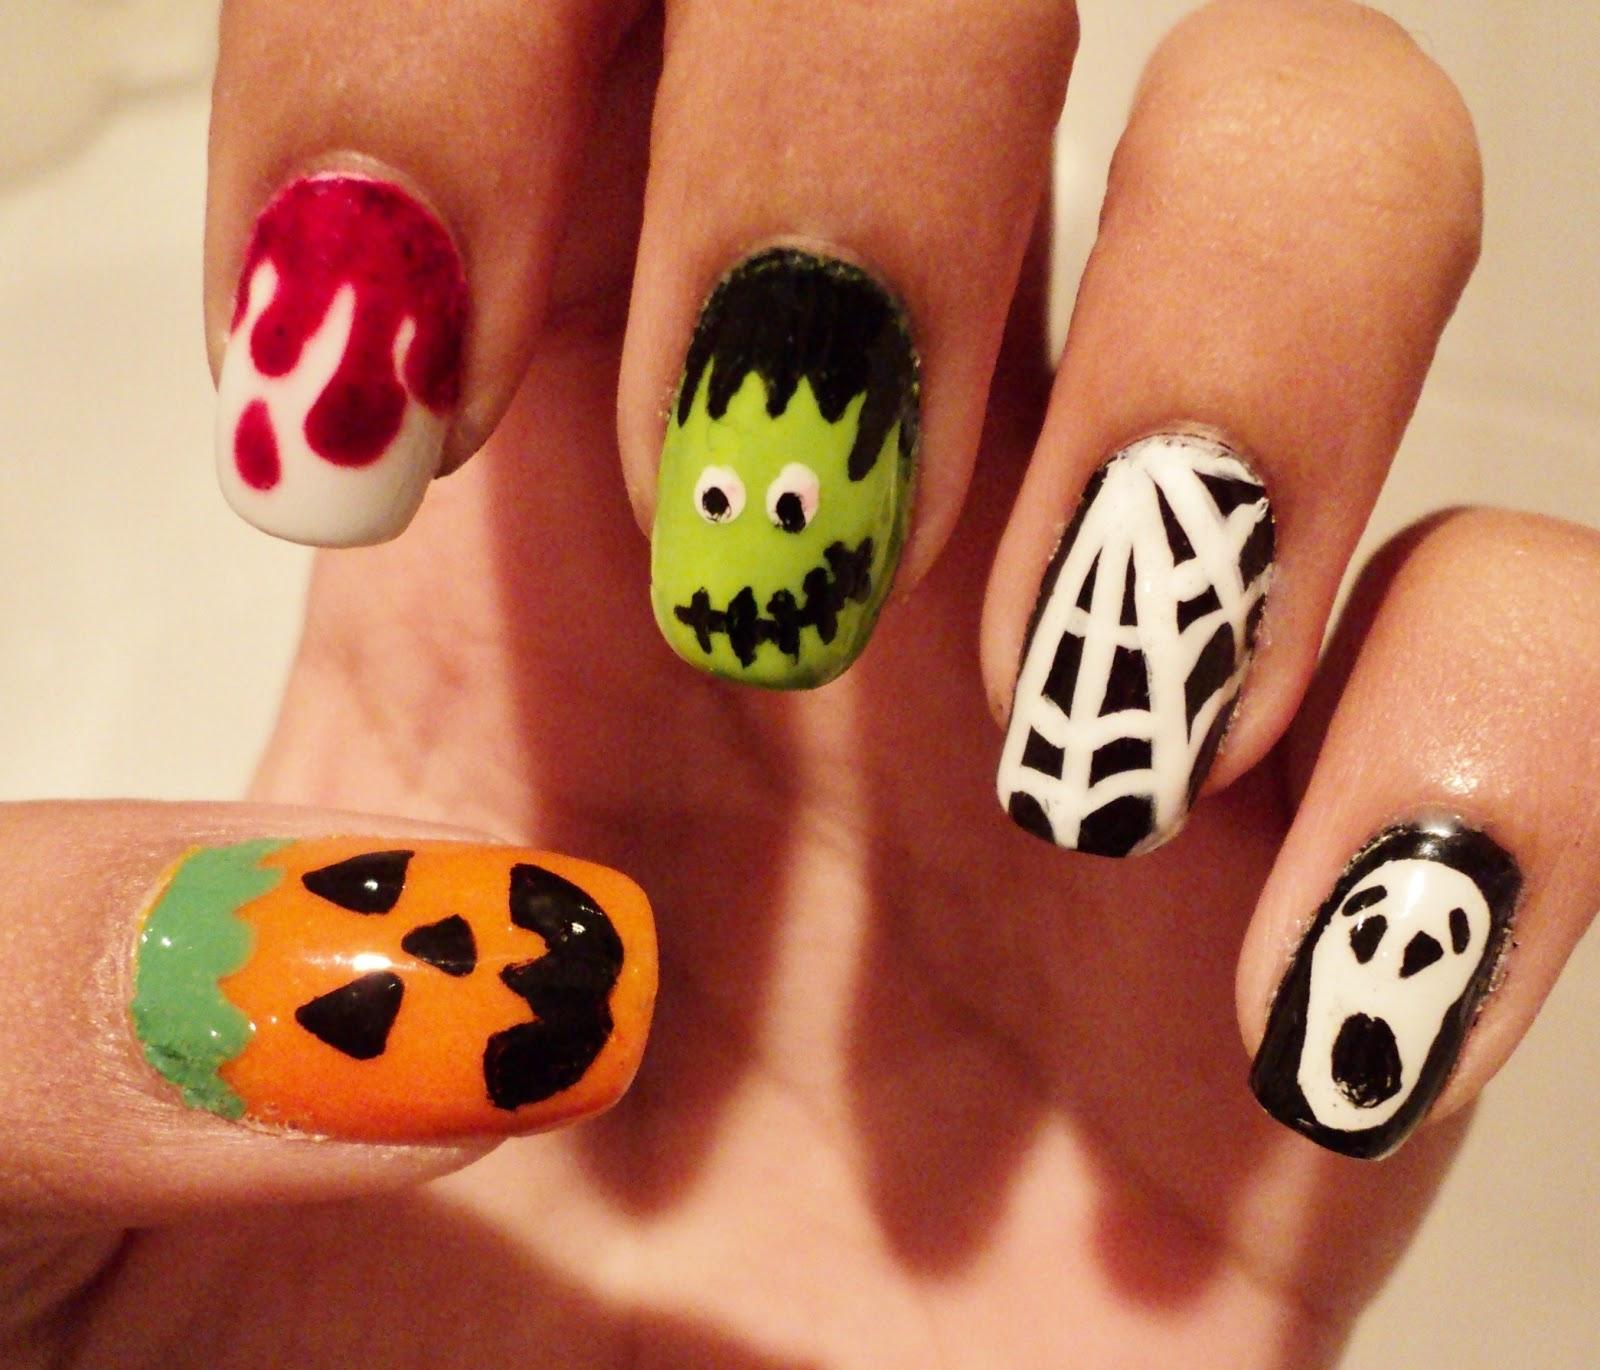 Diva's Diary: Halloween Nail Art!